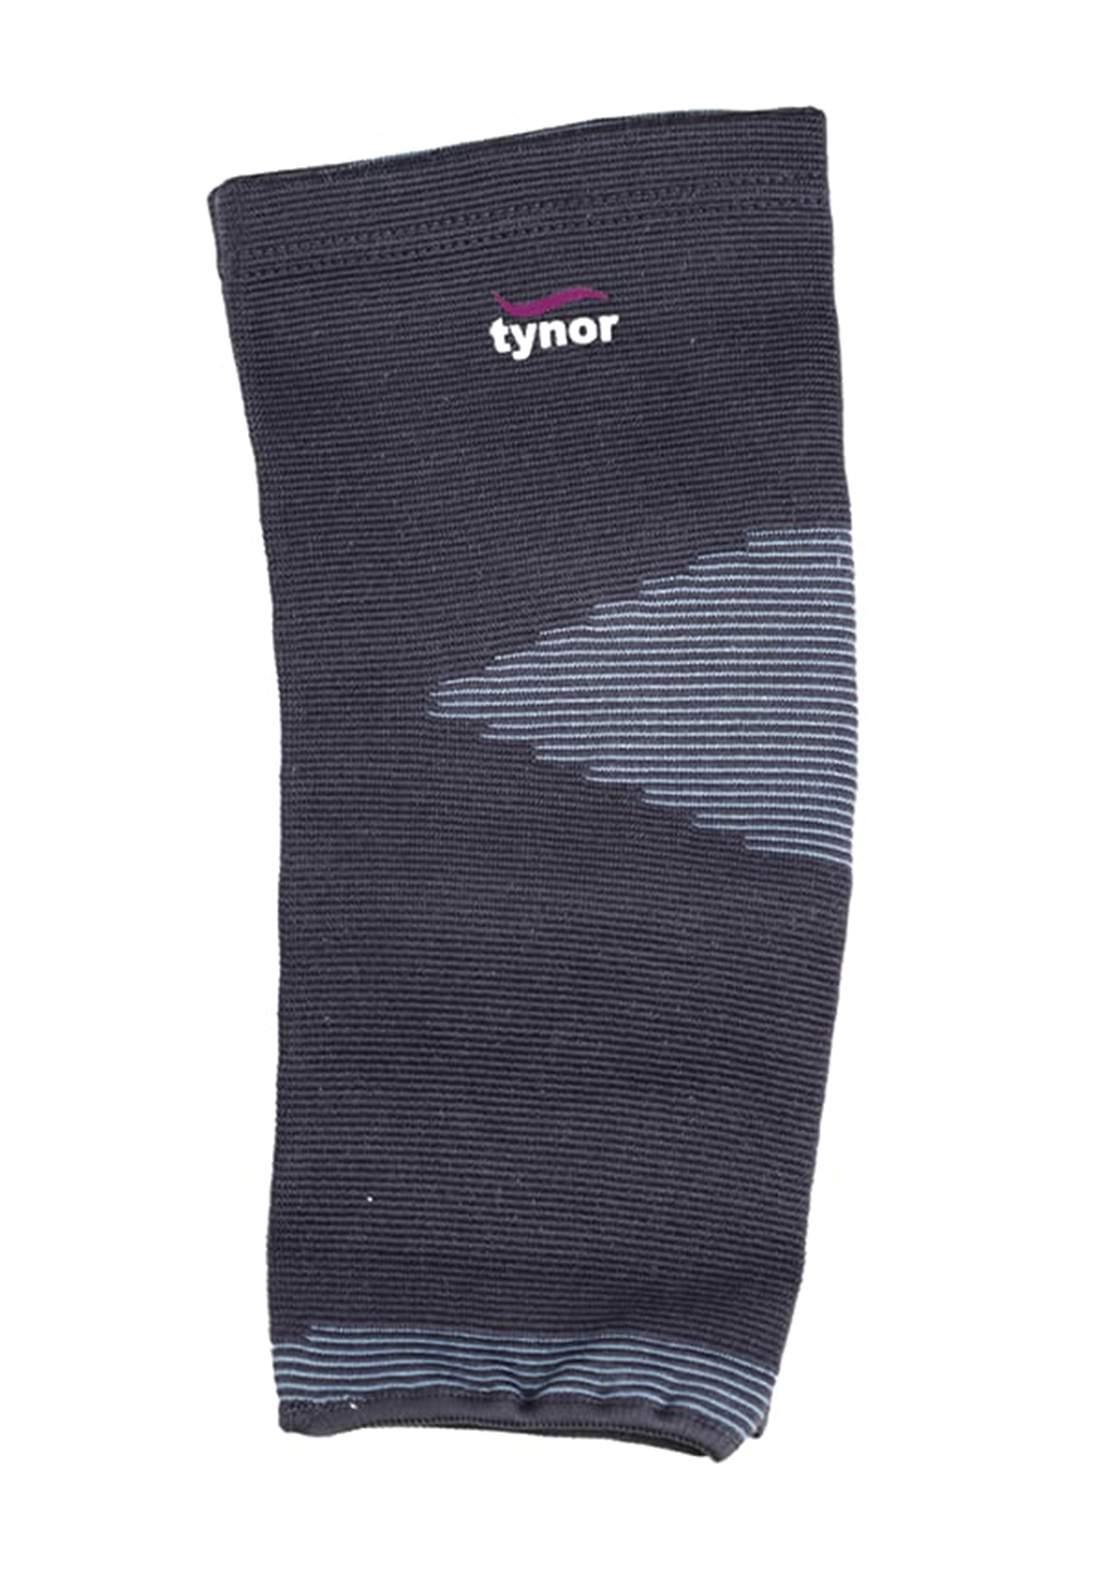 TynorD-23 Knee Cap Comfeel كيتر للركبة